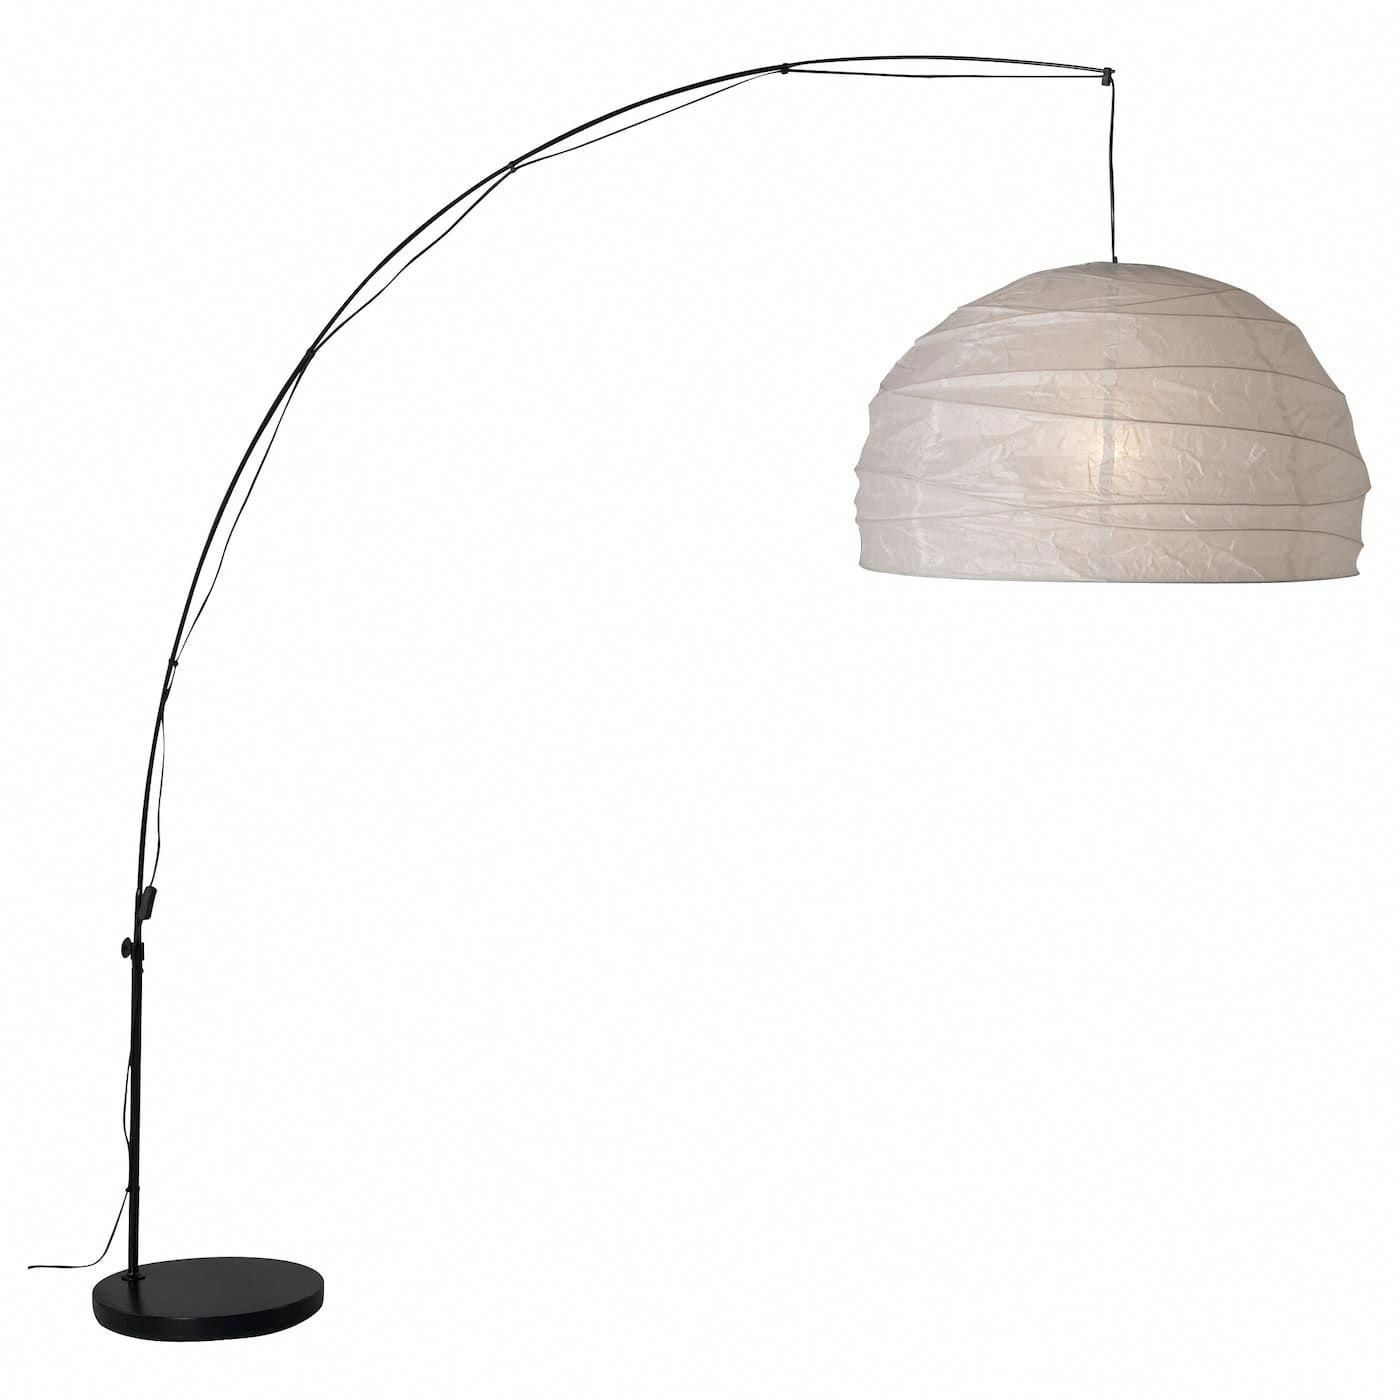 Ikea Regolit Floor Lamp With Led Bulb Bedroomlamps In 2020 Ikea Floor Lamp Arc Floor Lamps Modern Contemporary Floor Lamp